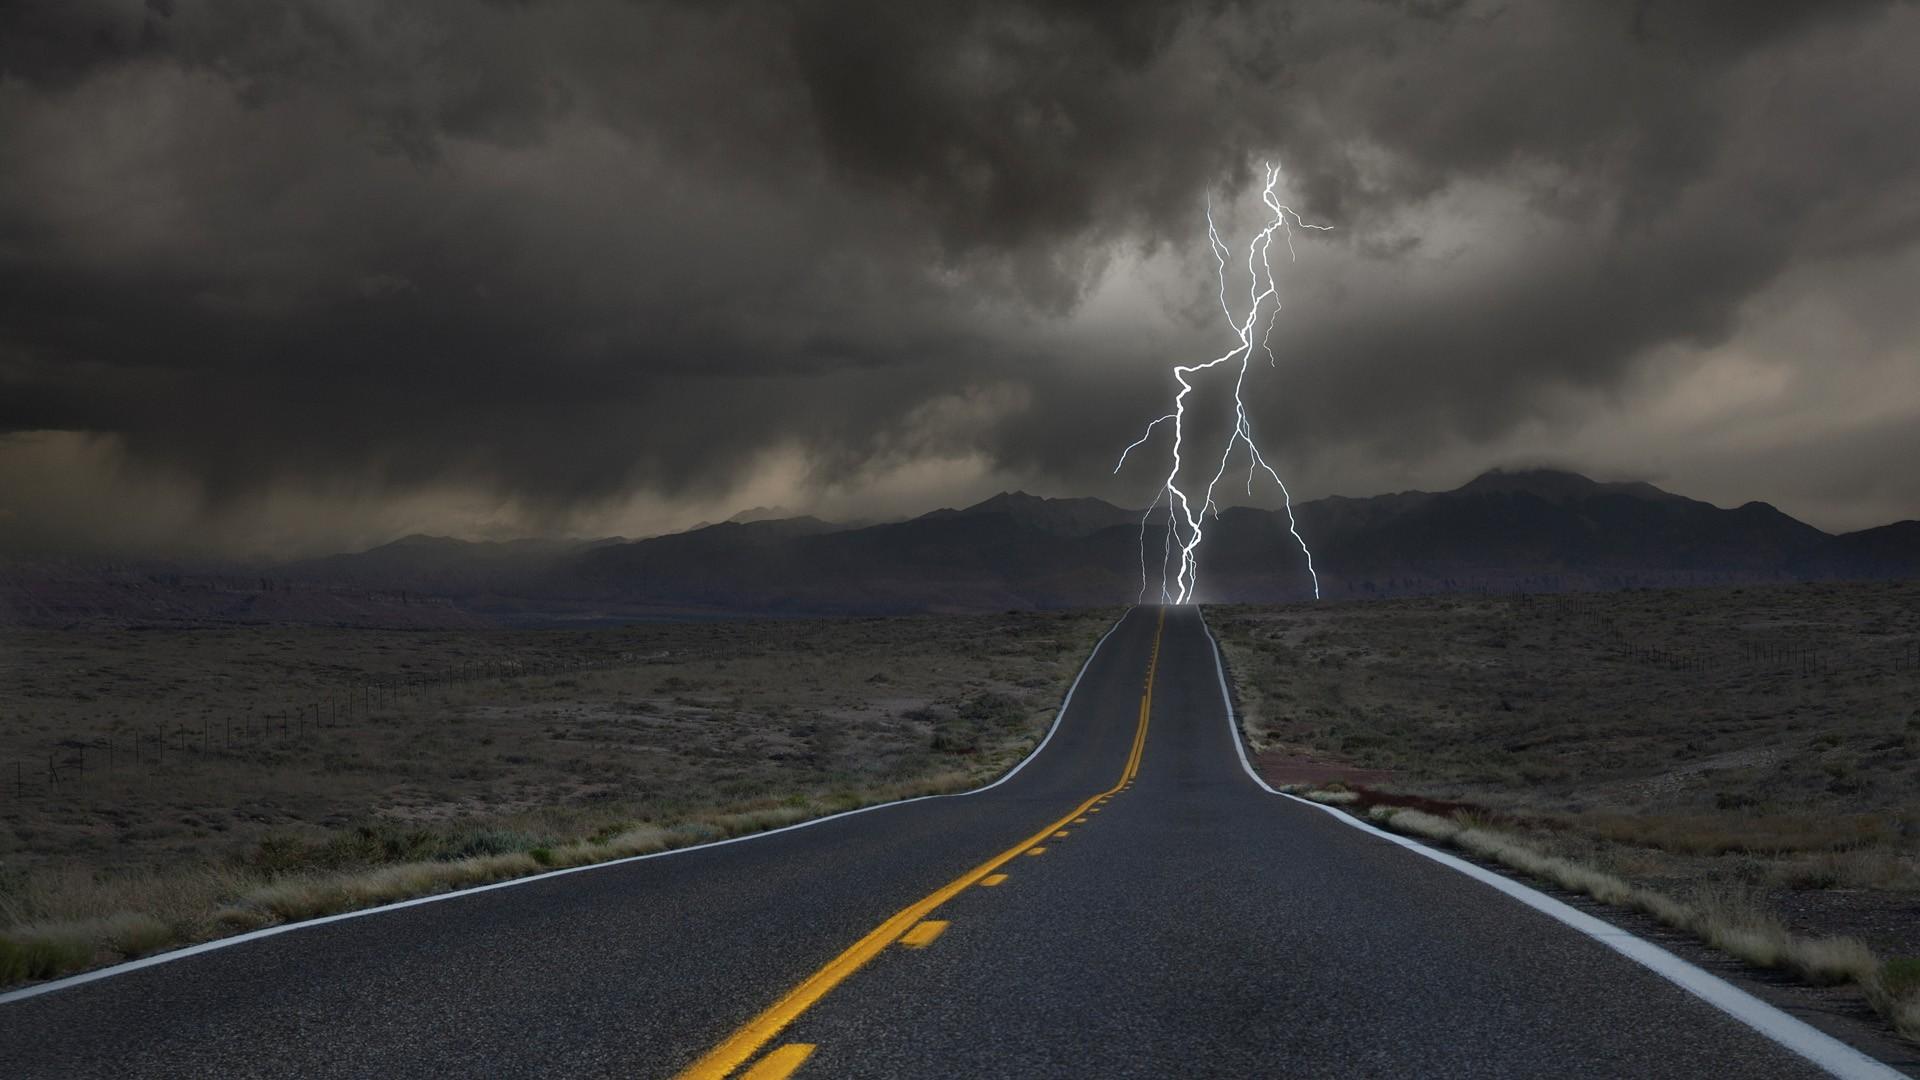 Landscape Mountains Dark Nature Grass Field Road Clouds Lightning Storm Hills Desert Wind Horizon Valley Fence